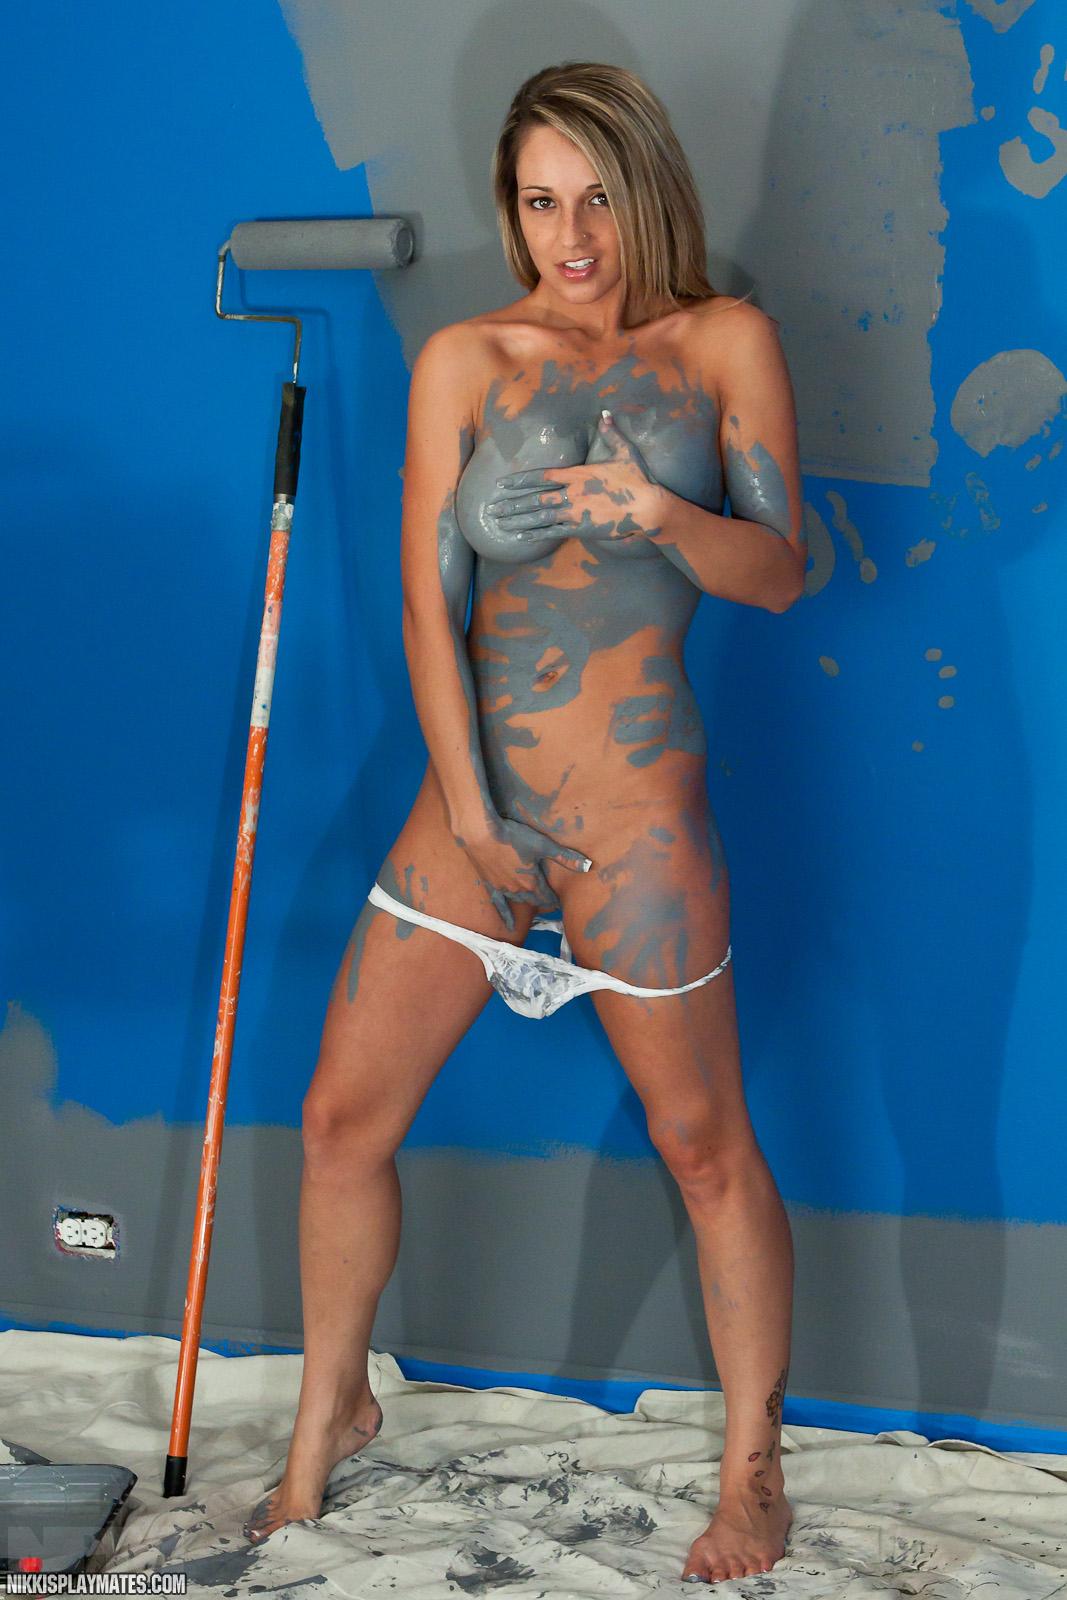 nude gang girls pics